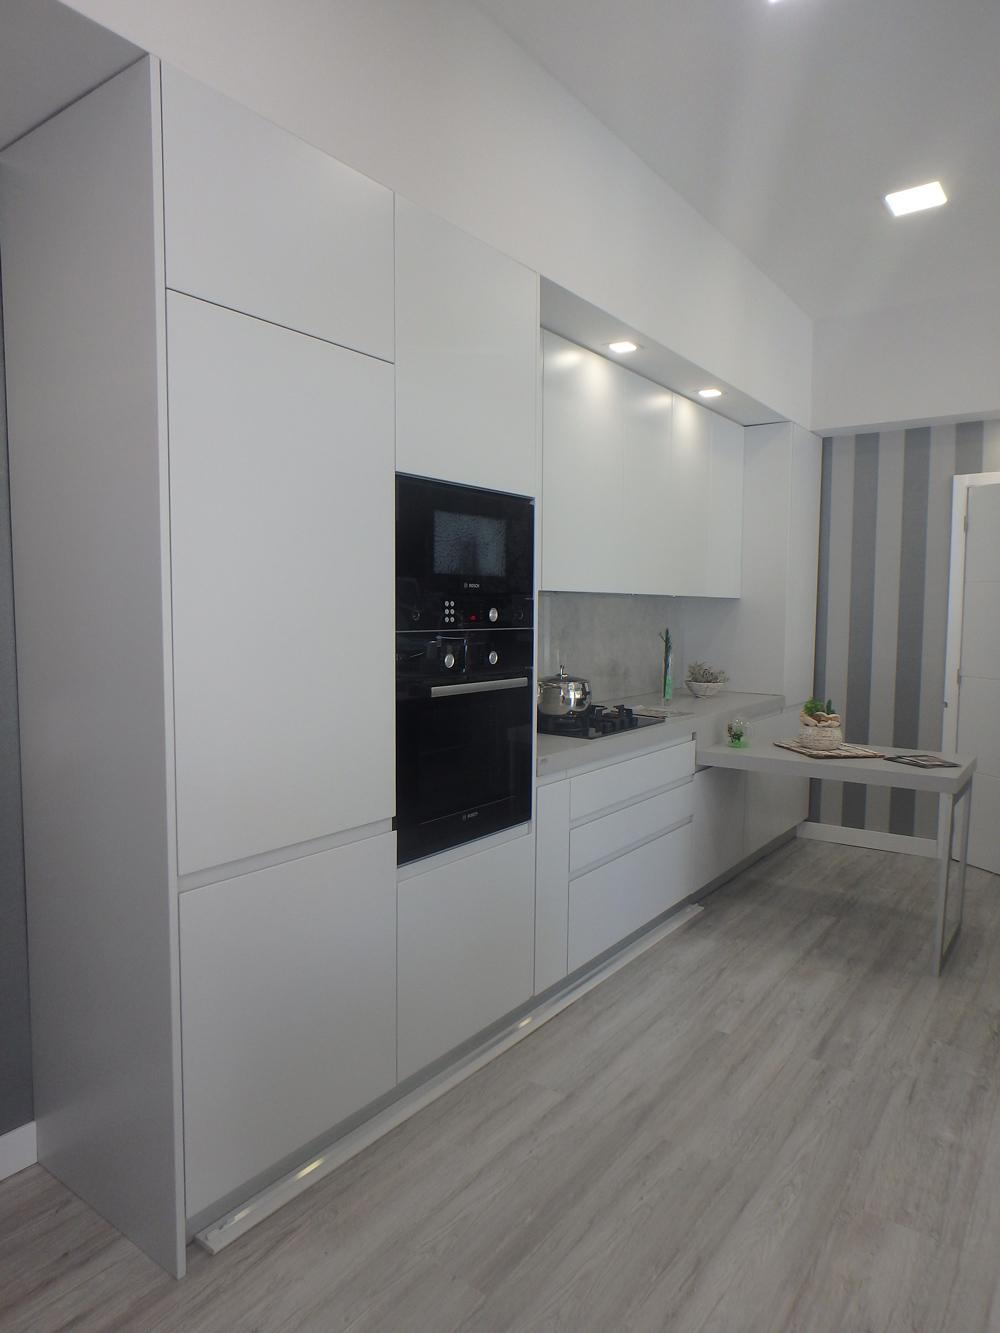 Projectos A Cozinha